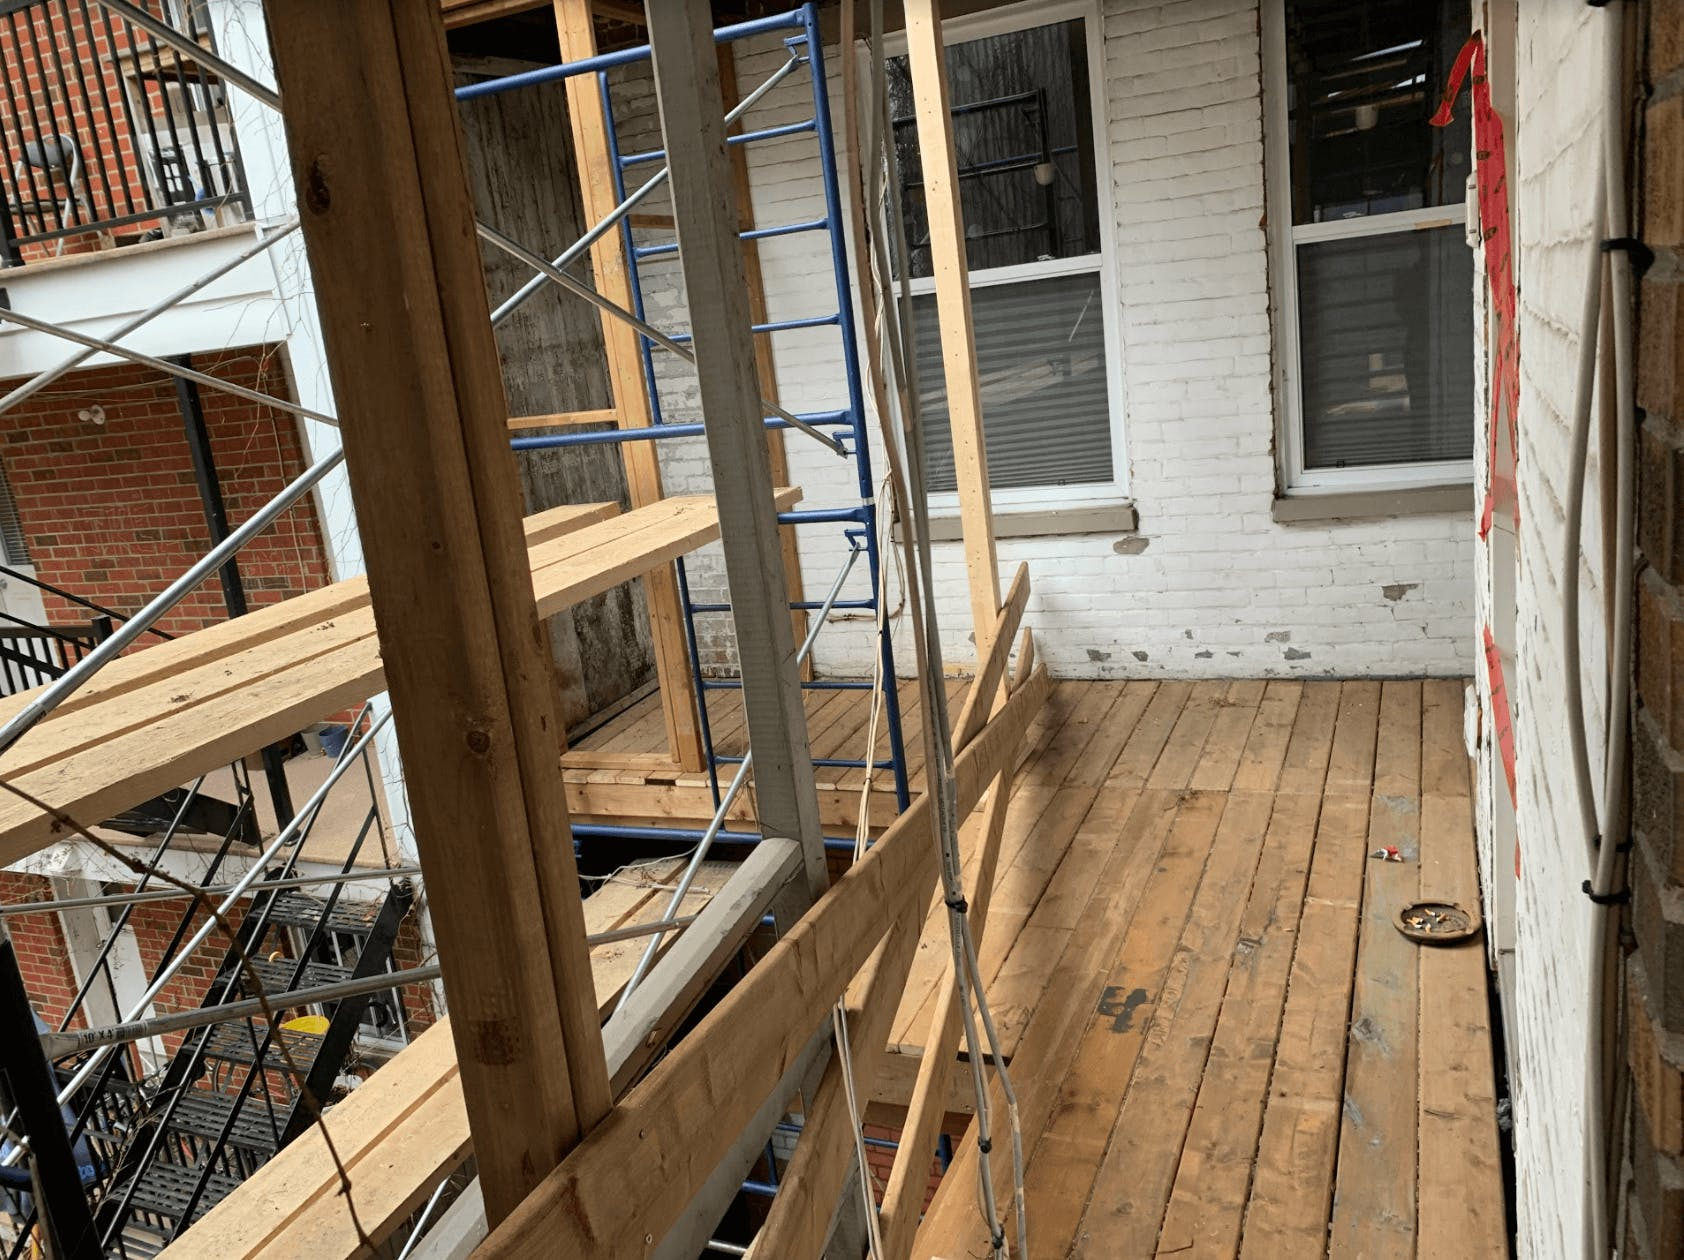 Balcon, en cours de rénovation